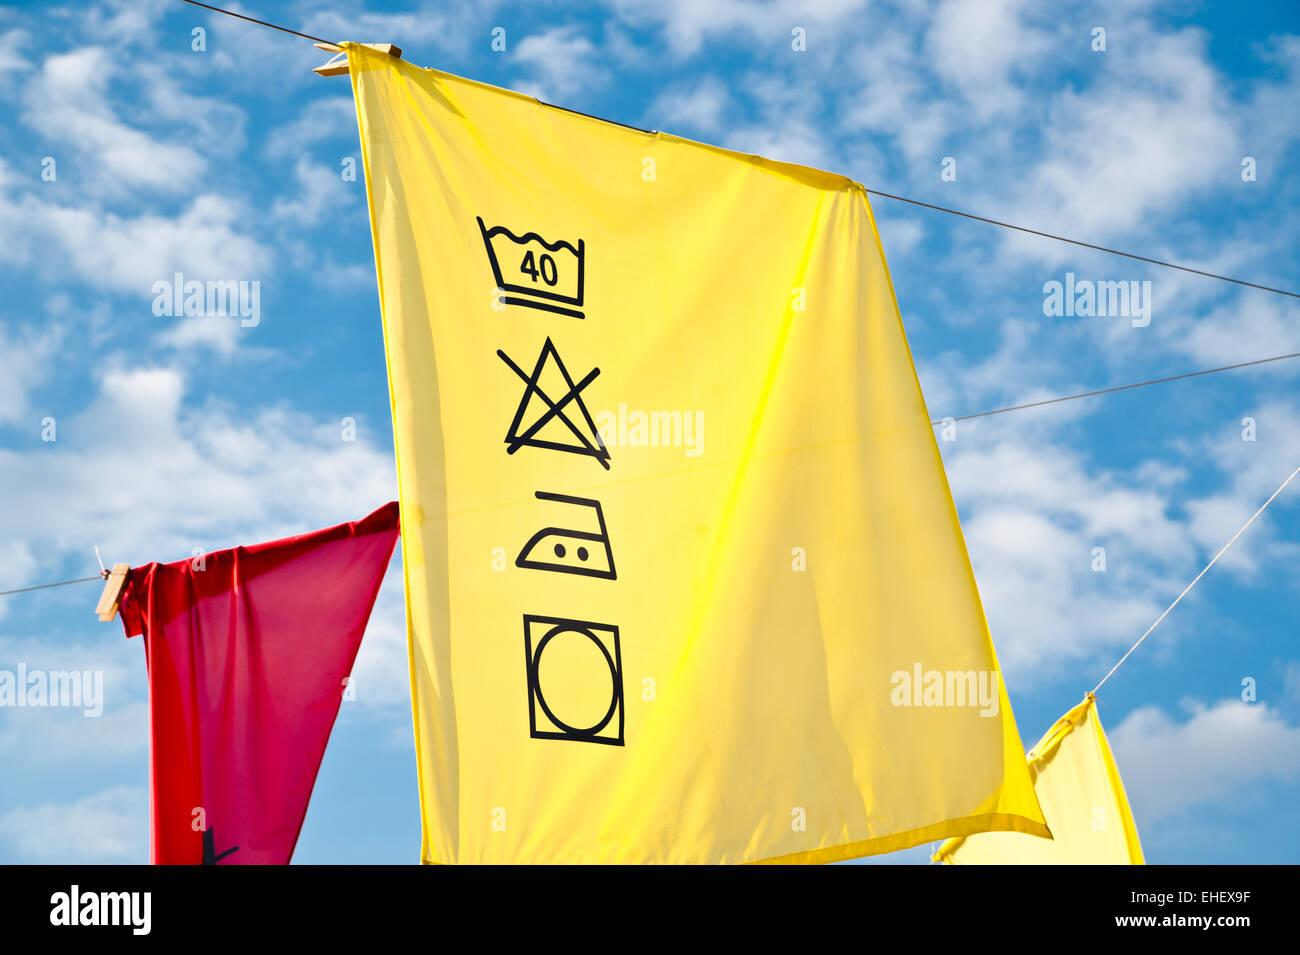 Colorful Washing Description - Stock Image